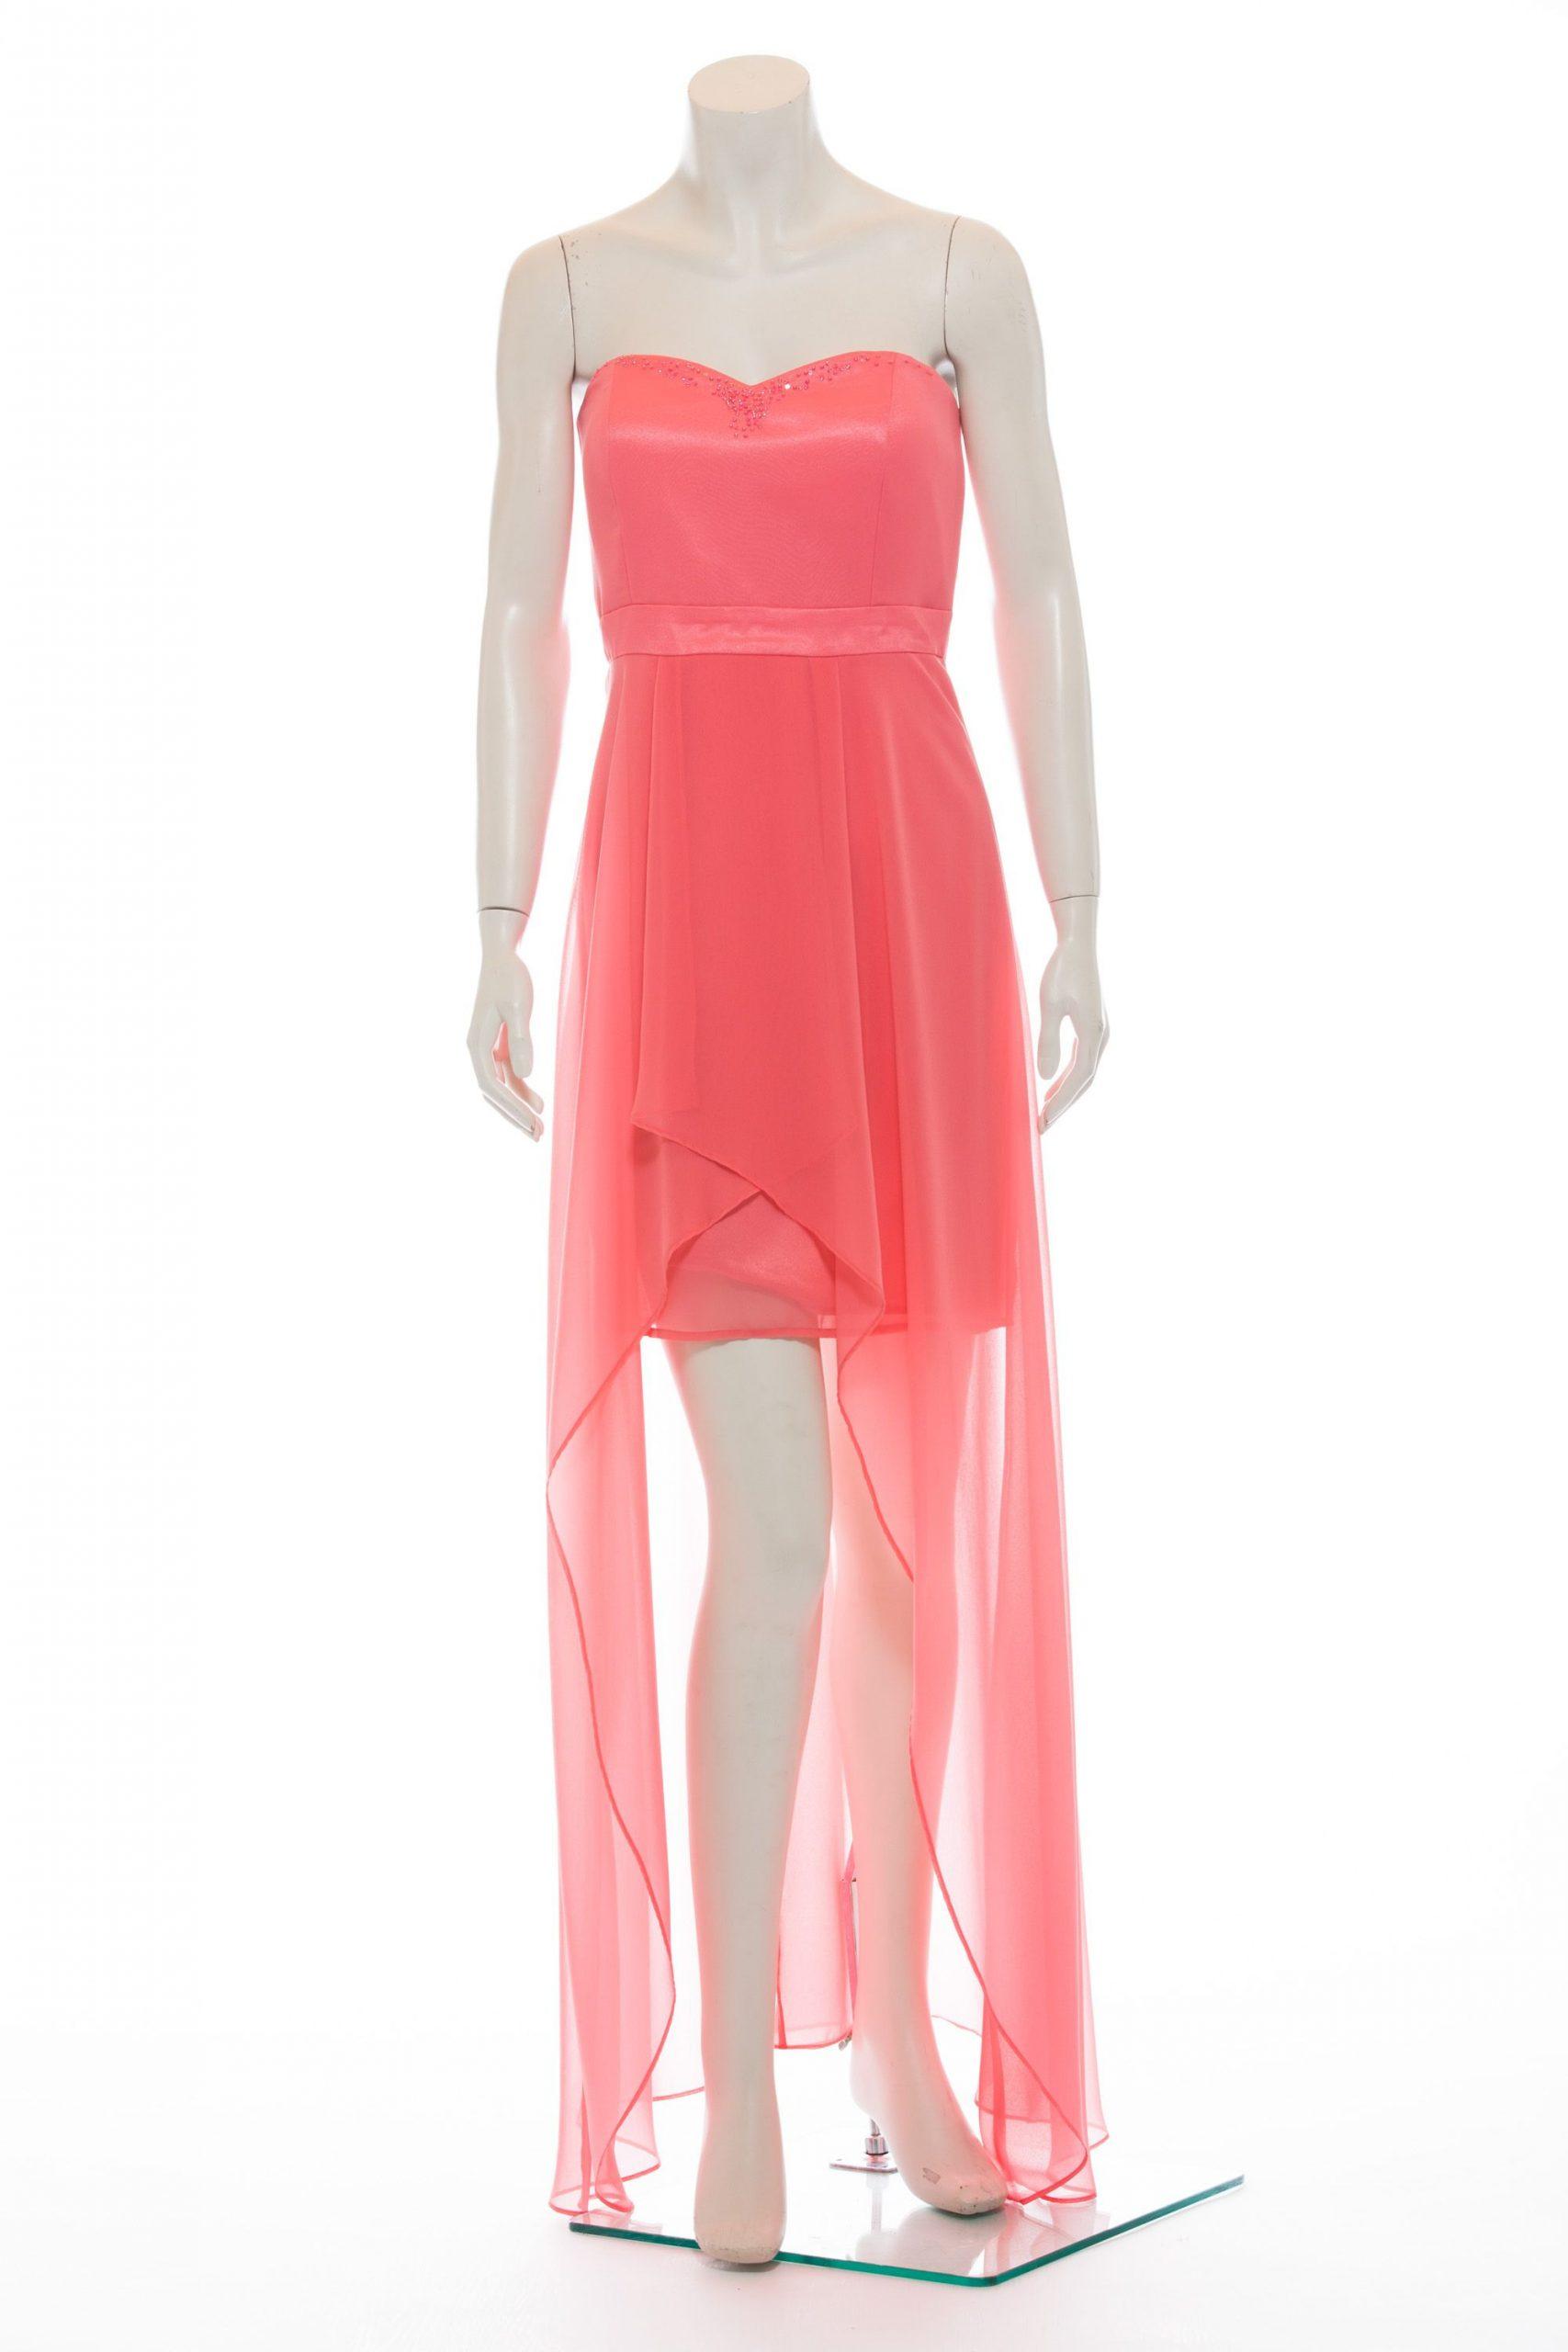 15 Perfekt Pinkes Abendkleid DesignAbend Leicht Pinkes Abendkleid Design